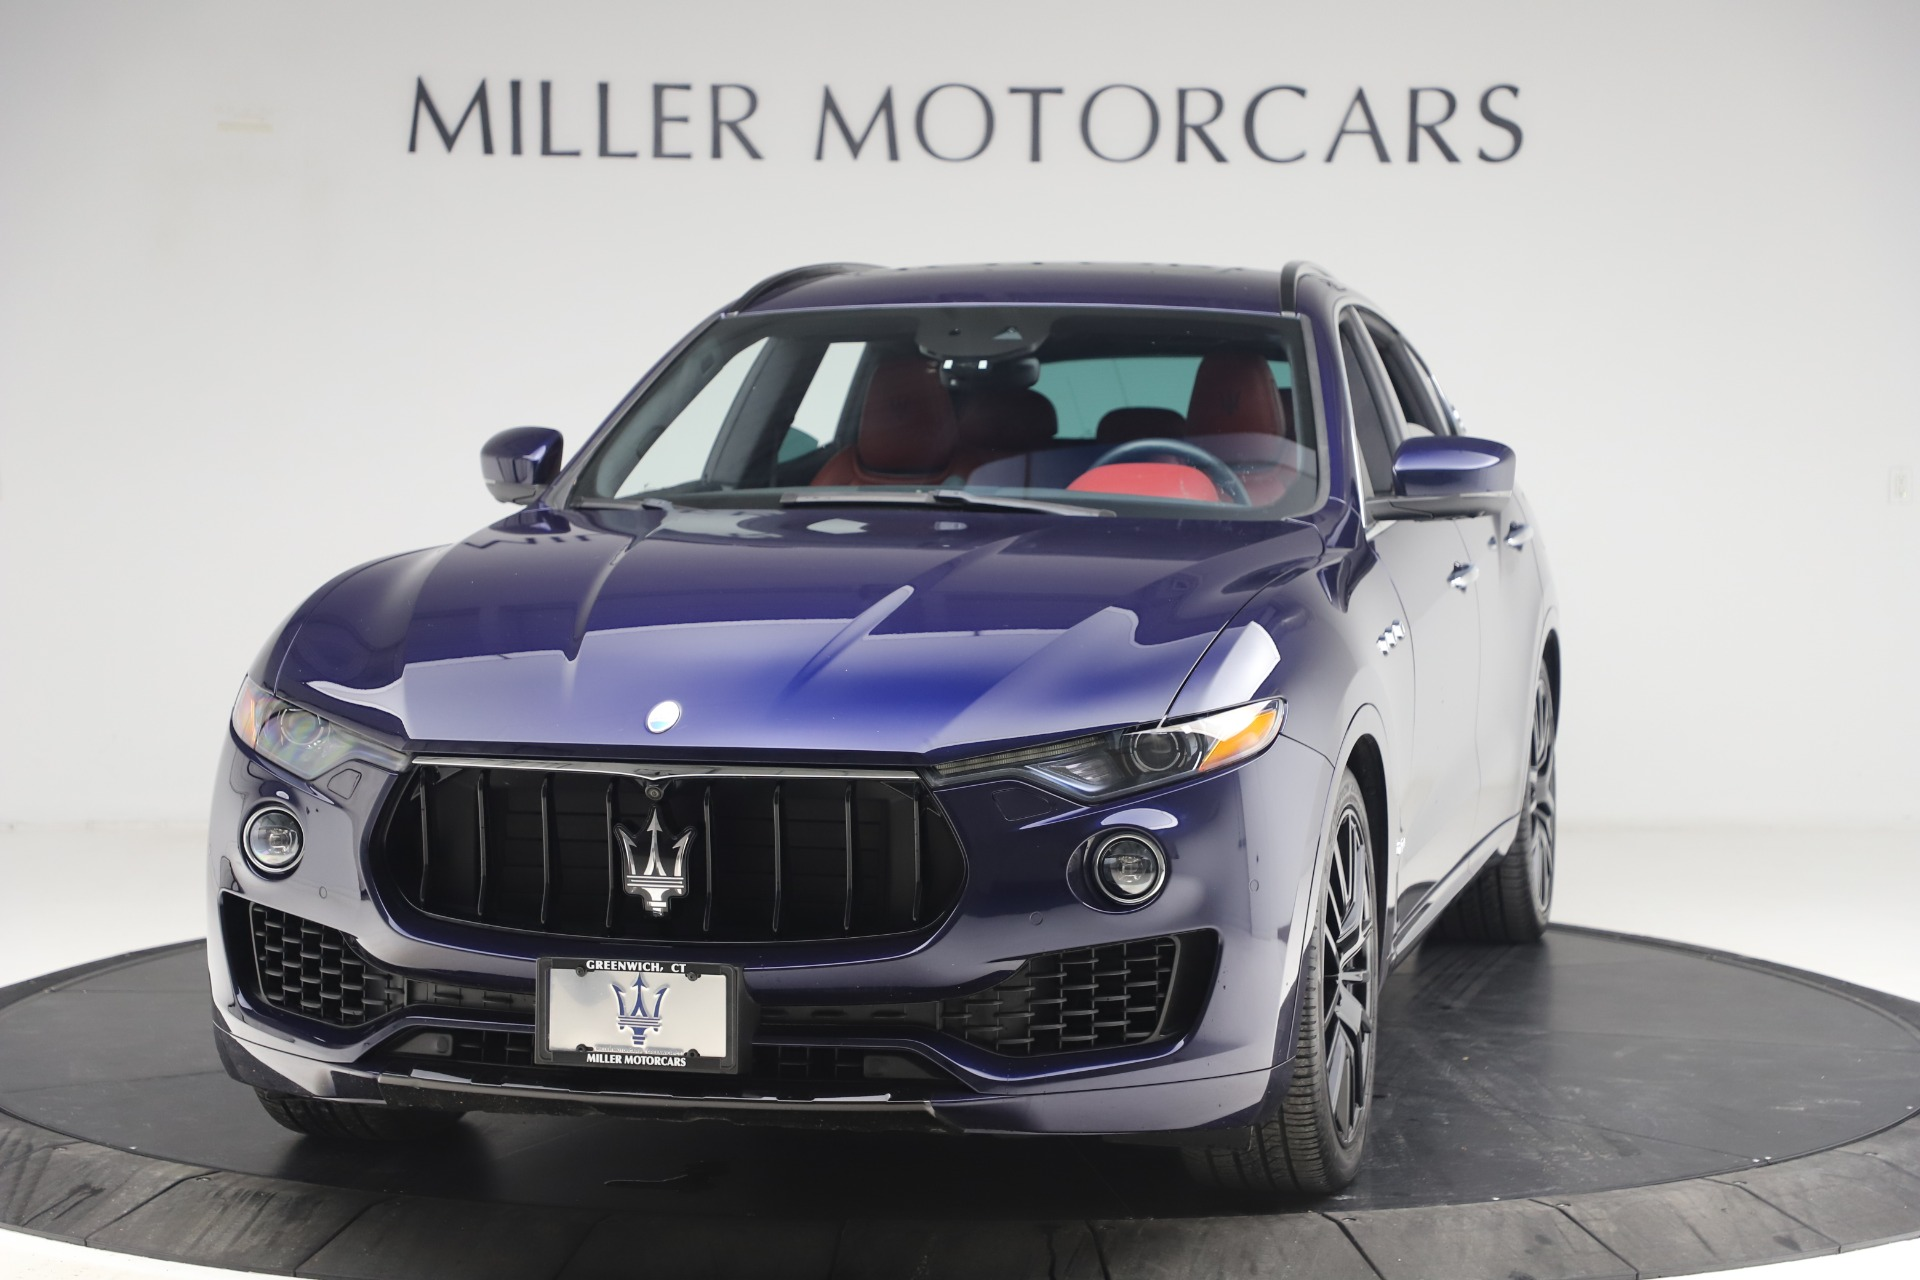 Used 2018 Maserati Levante S GranSport for sale $63,900 at Maserati of Westport in Westport CT 06880 1